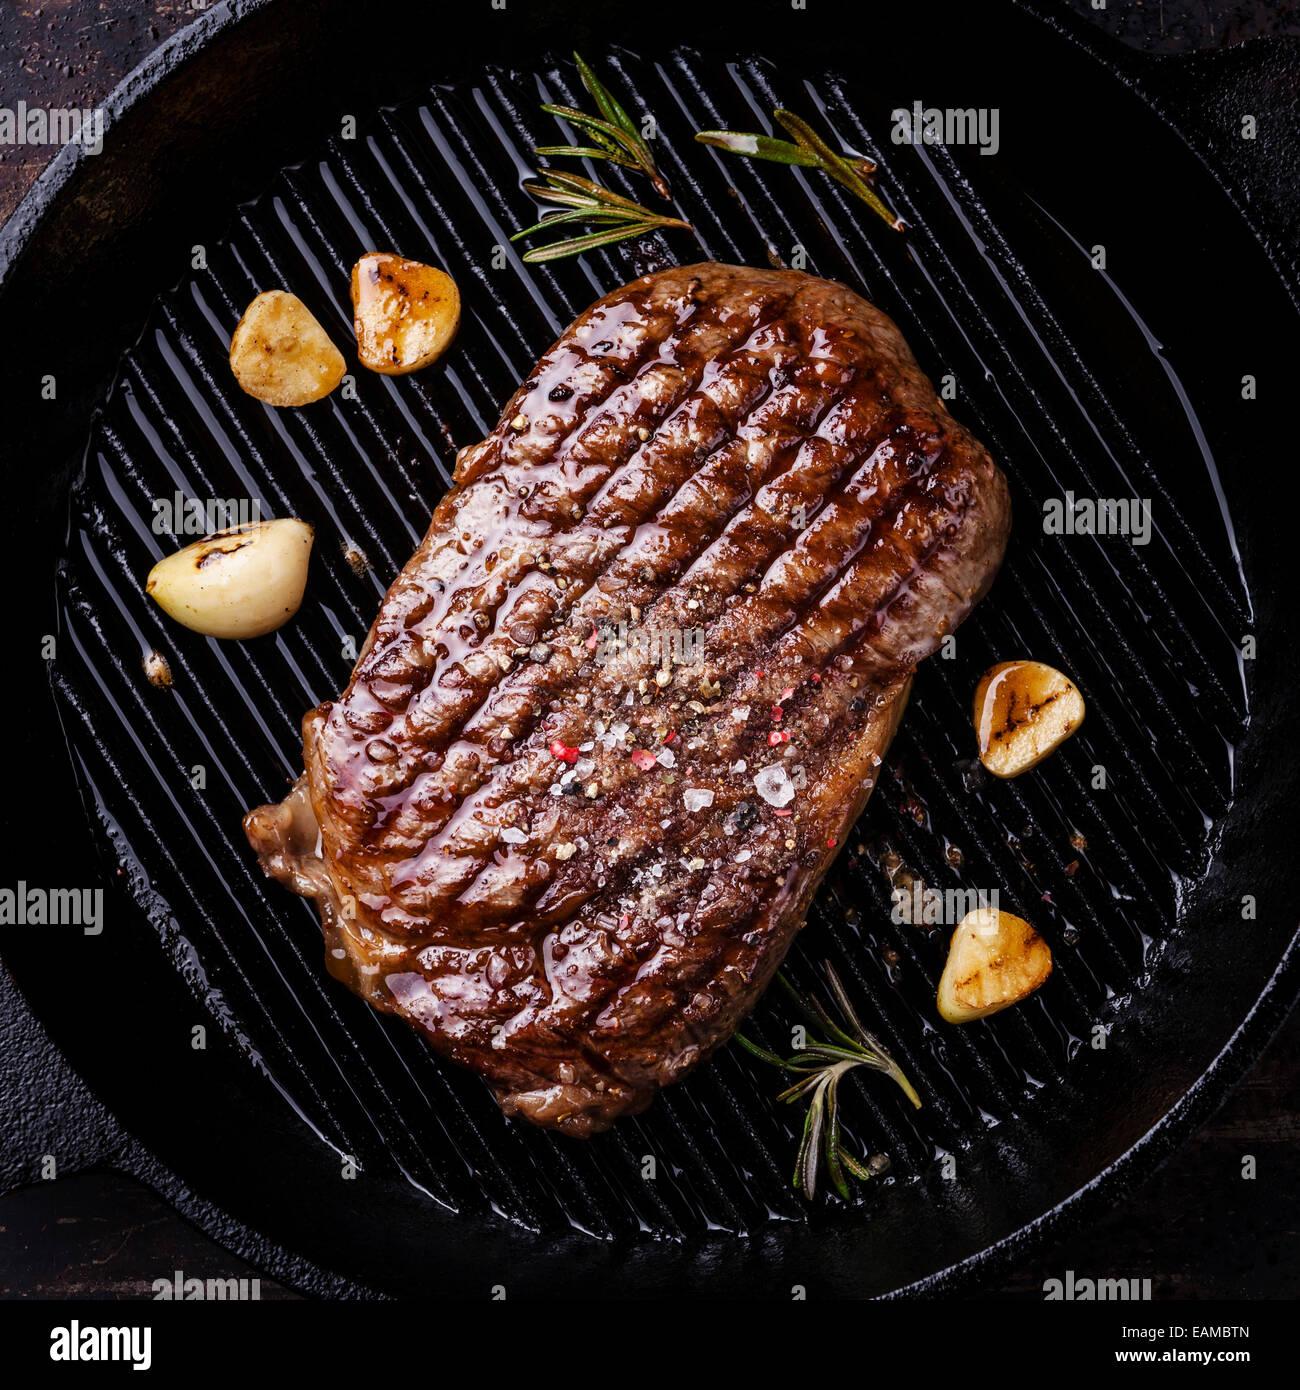 Grilled Ribeye steak on grill pan on dark background - Stock Image